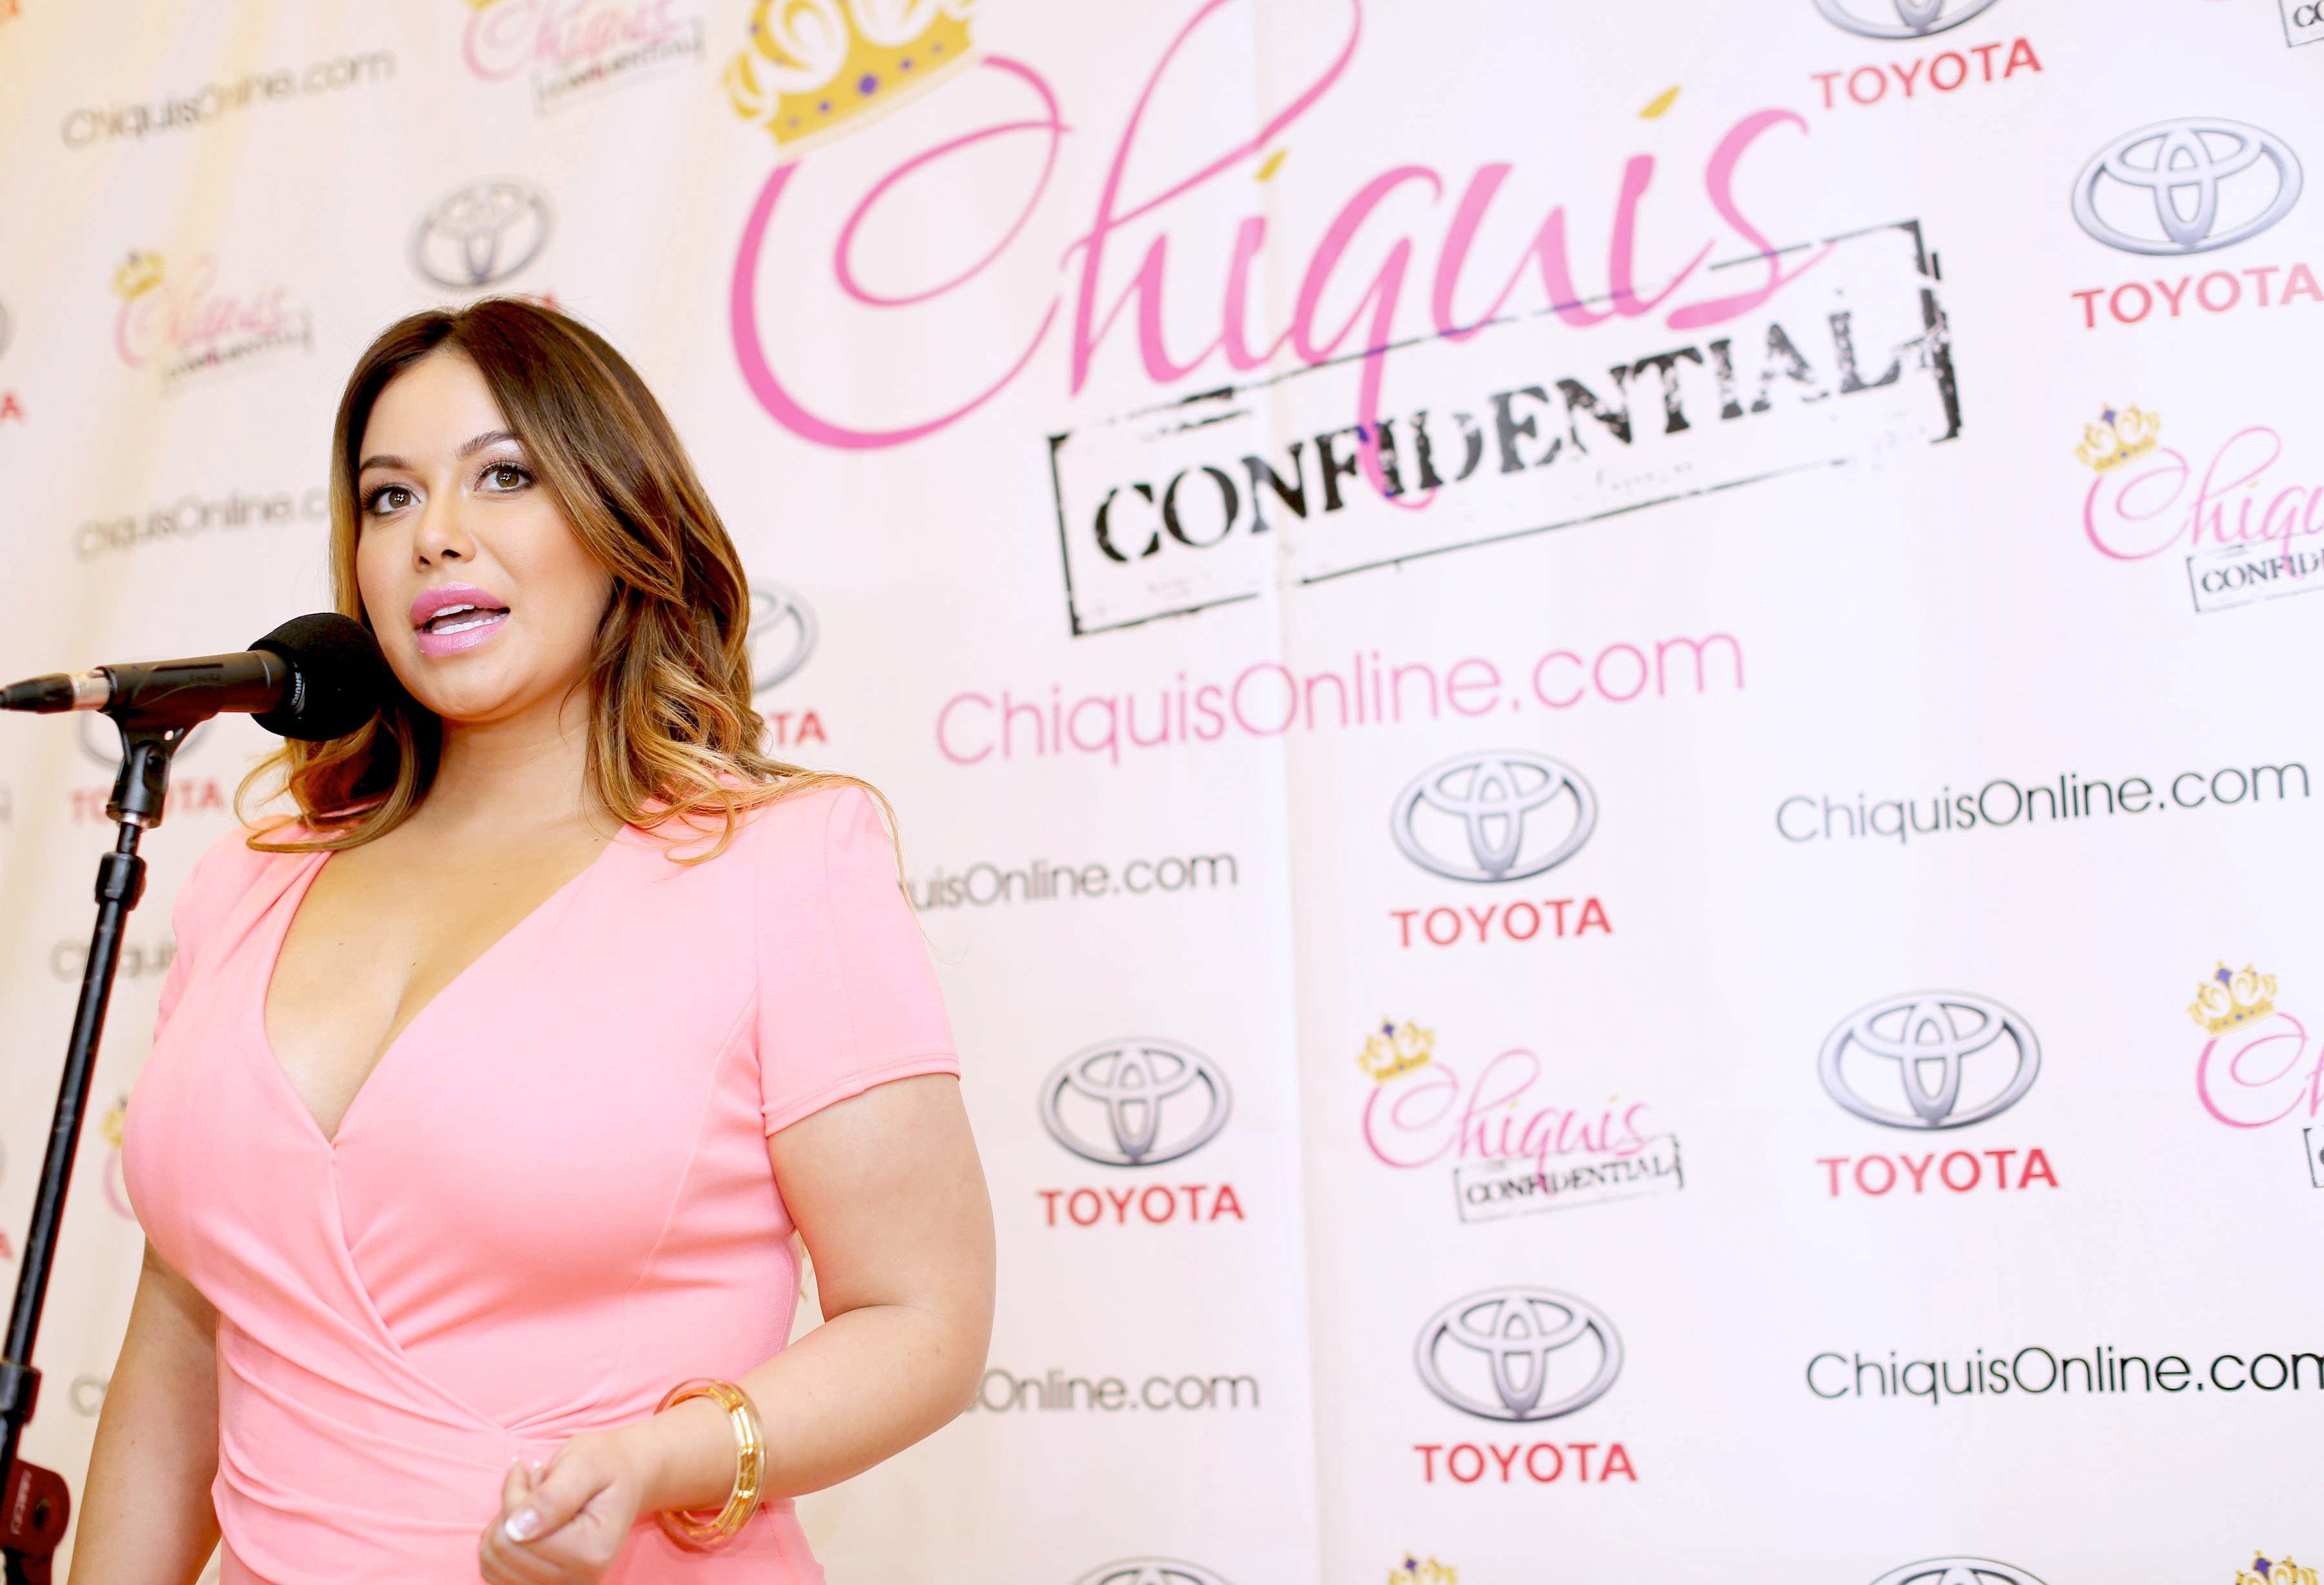 Ariadne Diaz Nalgas Chiquisconfidential113.jpg